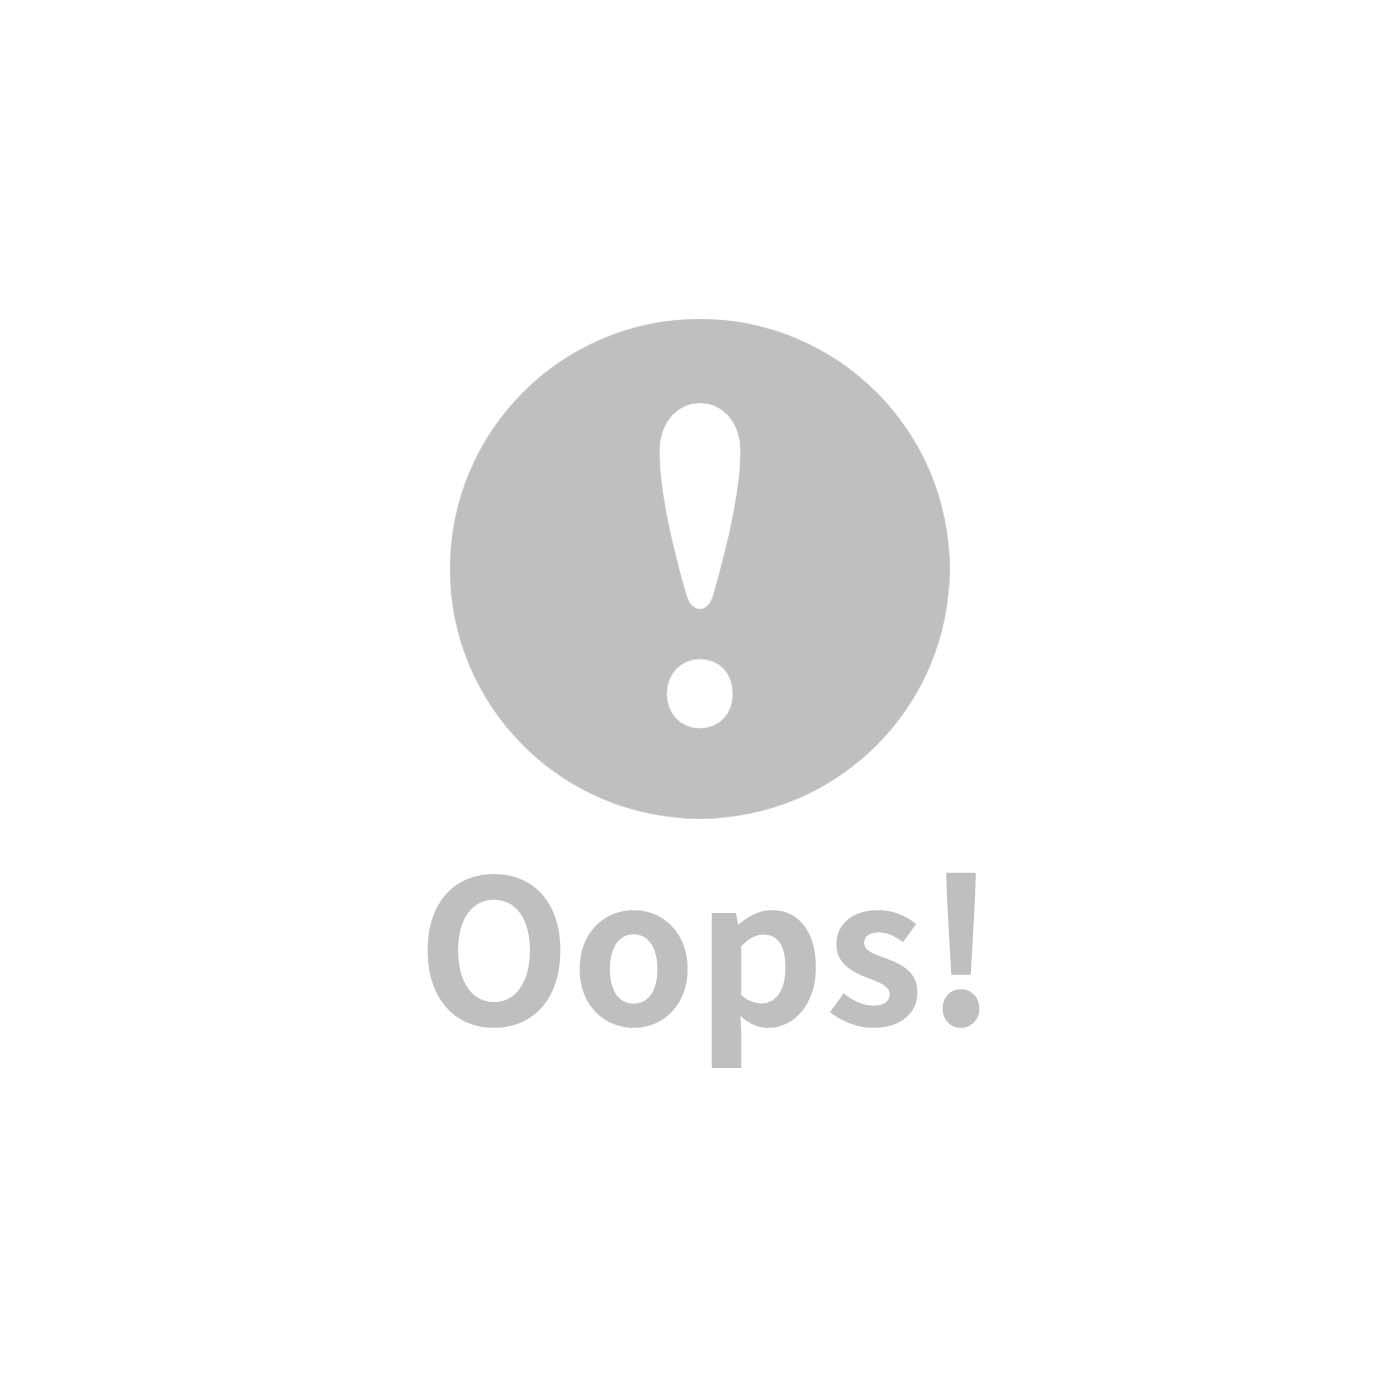 global affairs 童話手工編織安撫搖鈴_林地系列(小馴鹿)